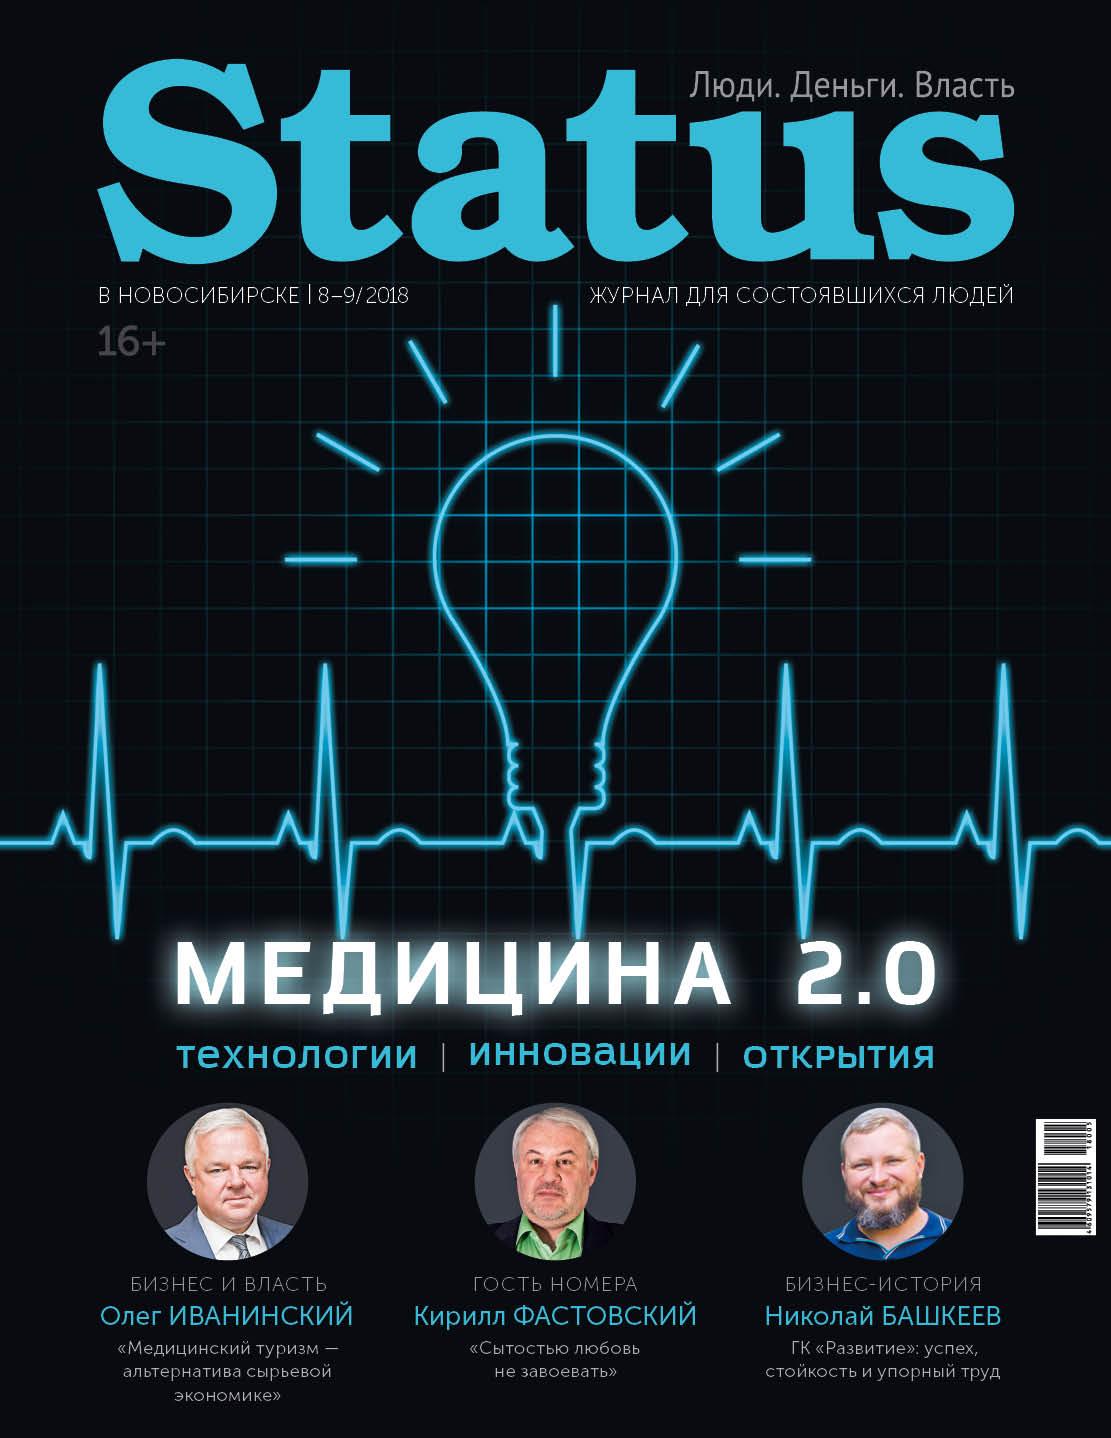 032225eb4b6 бизнес-журнал Status - новости и статьи по теме